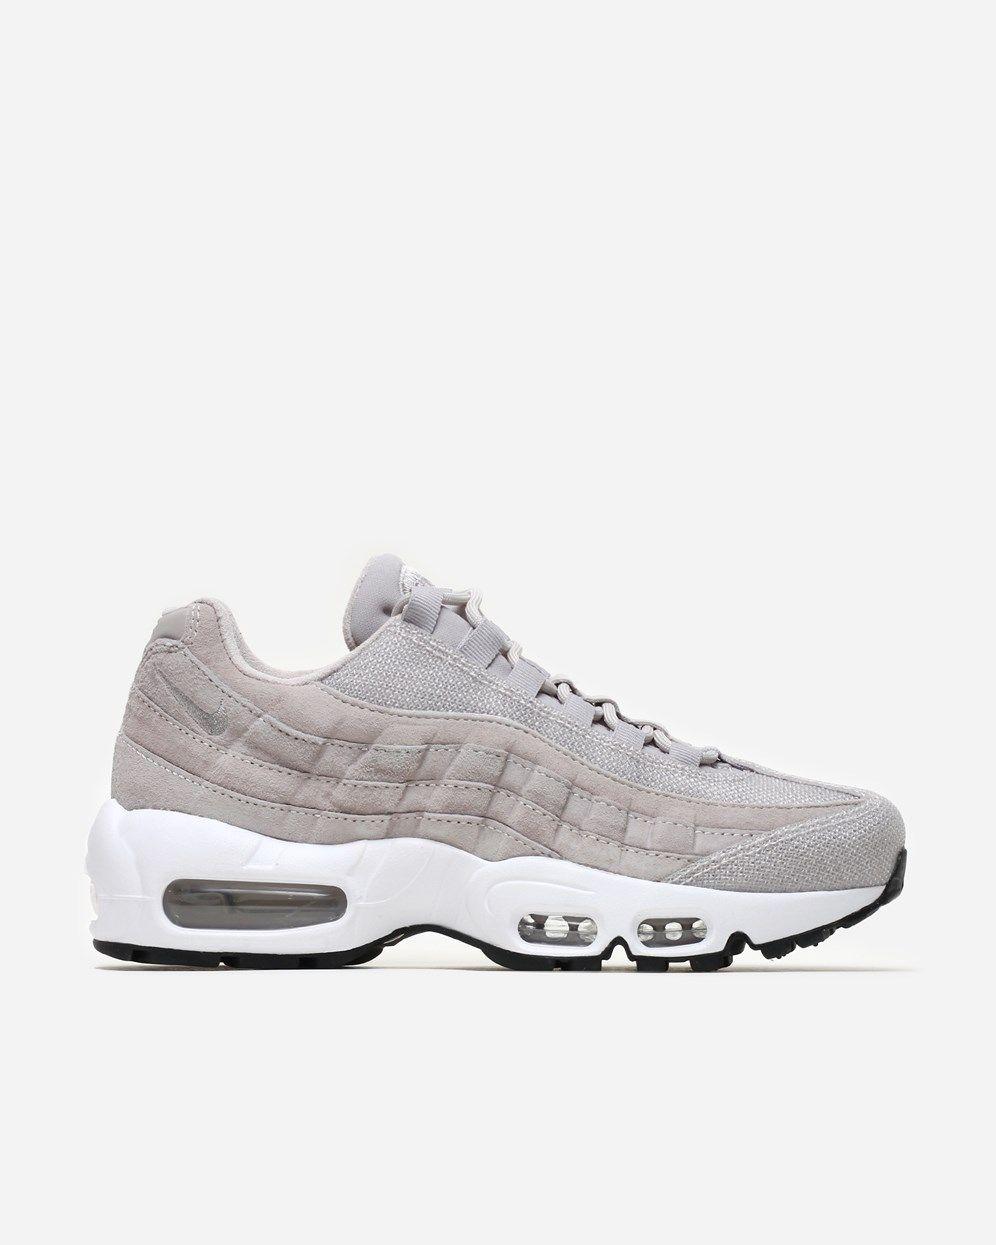 sale retailer 12c6b f849c Nike Sportswear Air Max 95 Premium 807443 200   Moon Particle   Footwear -  Naked